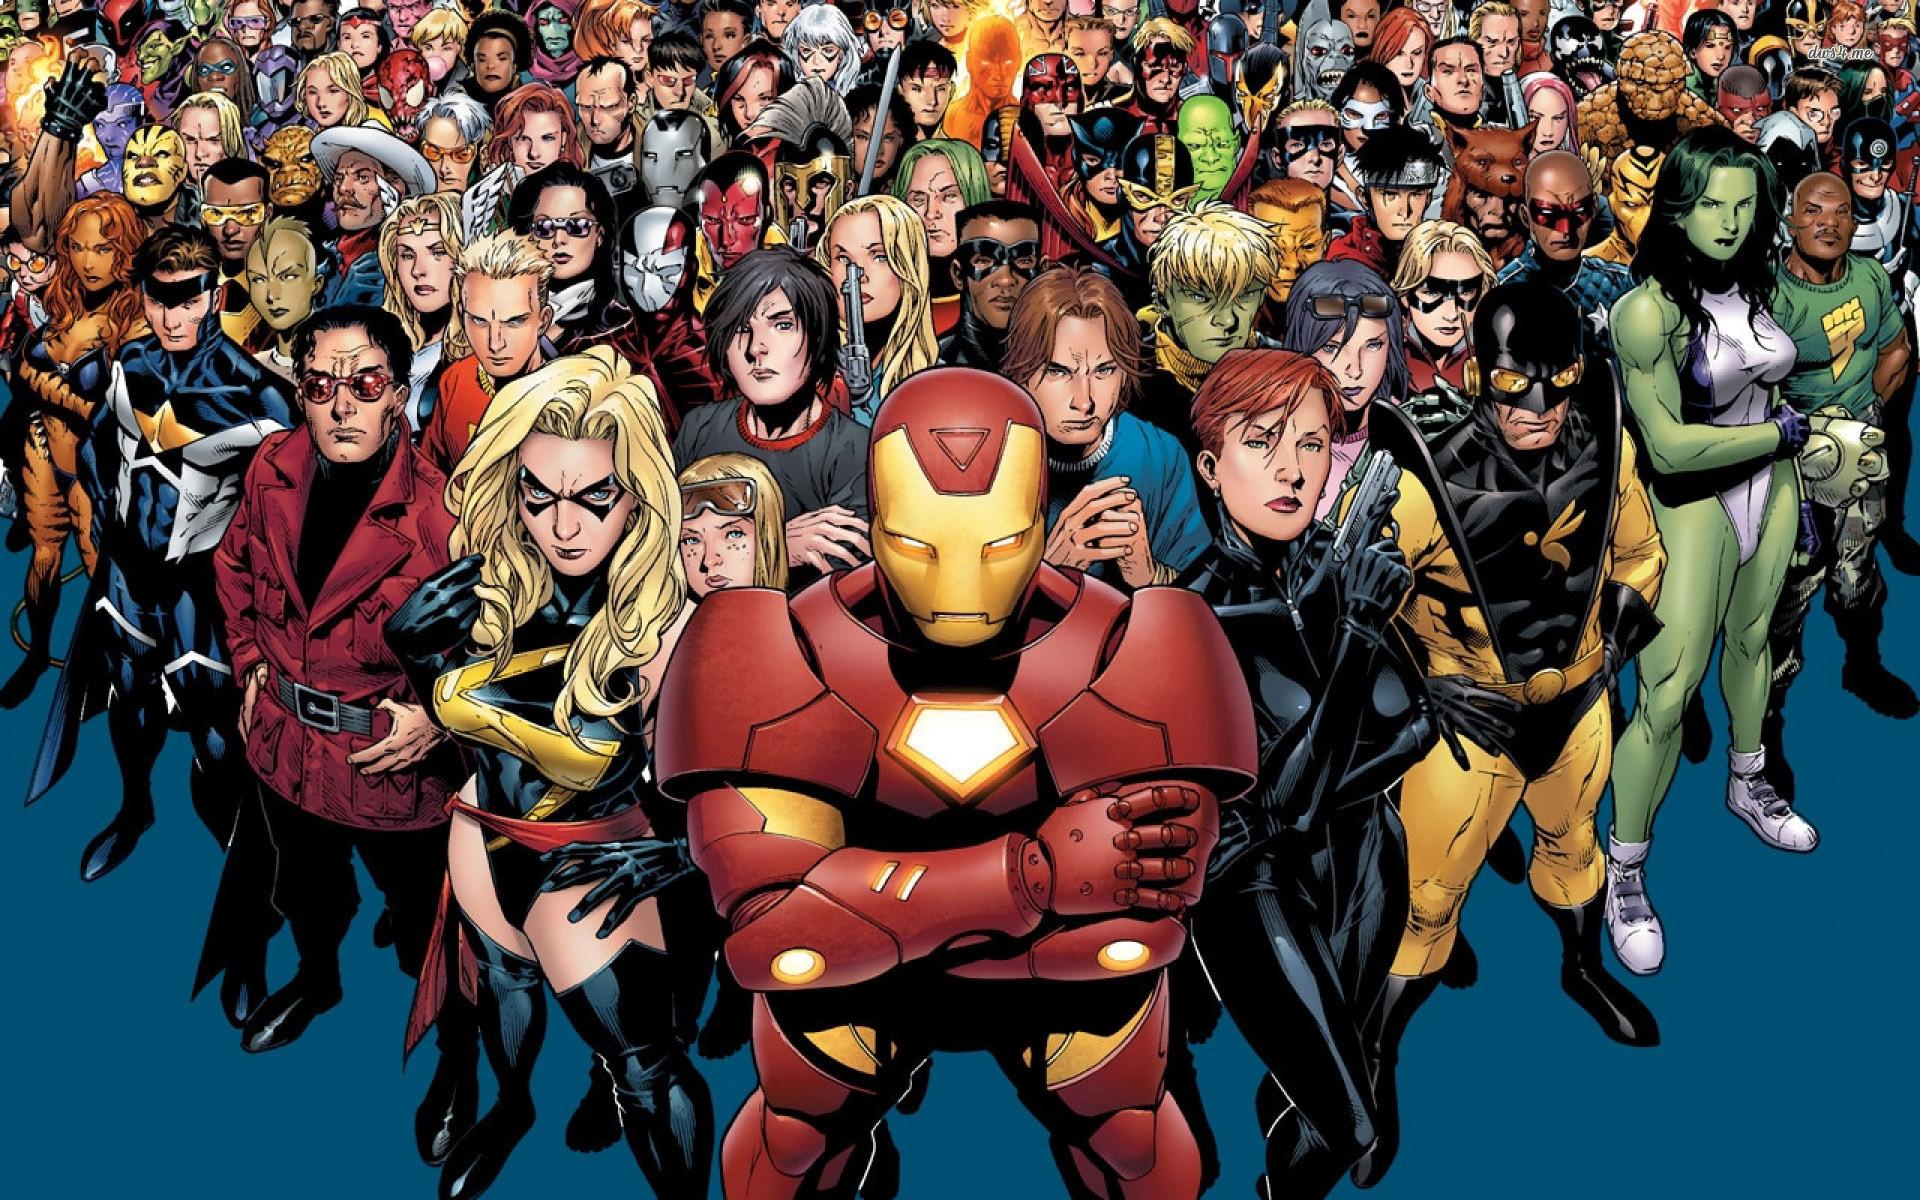 Marvel superheroes wallpapers wallpapersafari - All marvel heroes wallpaper ...